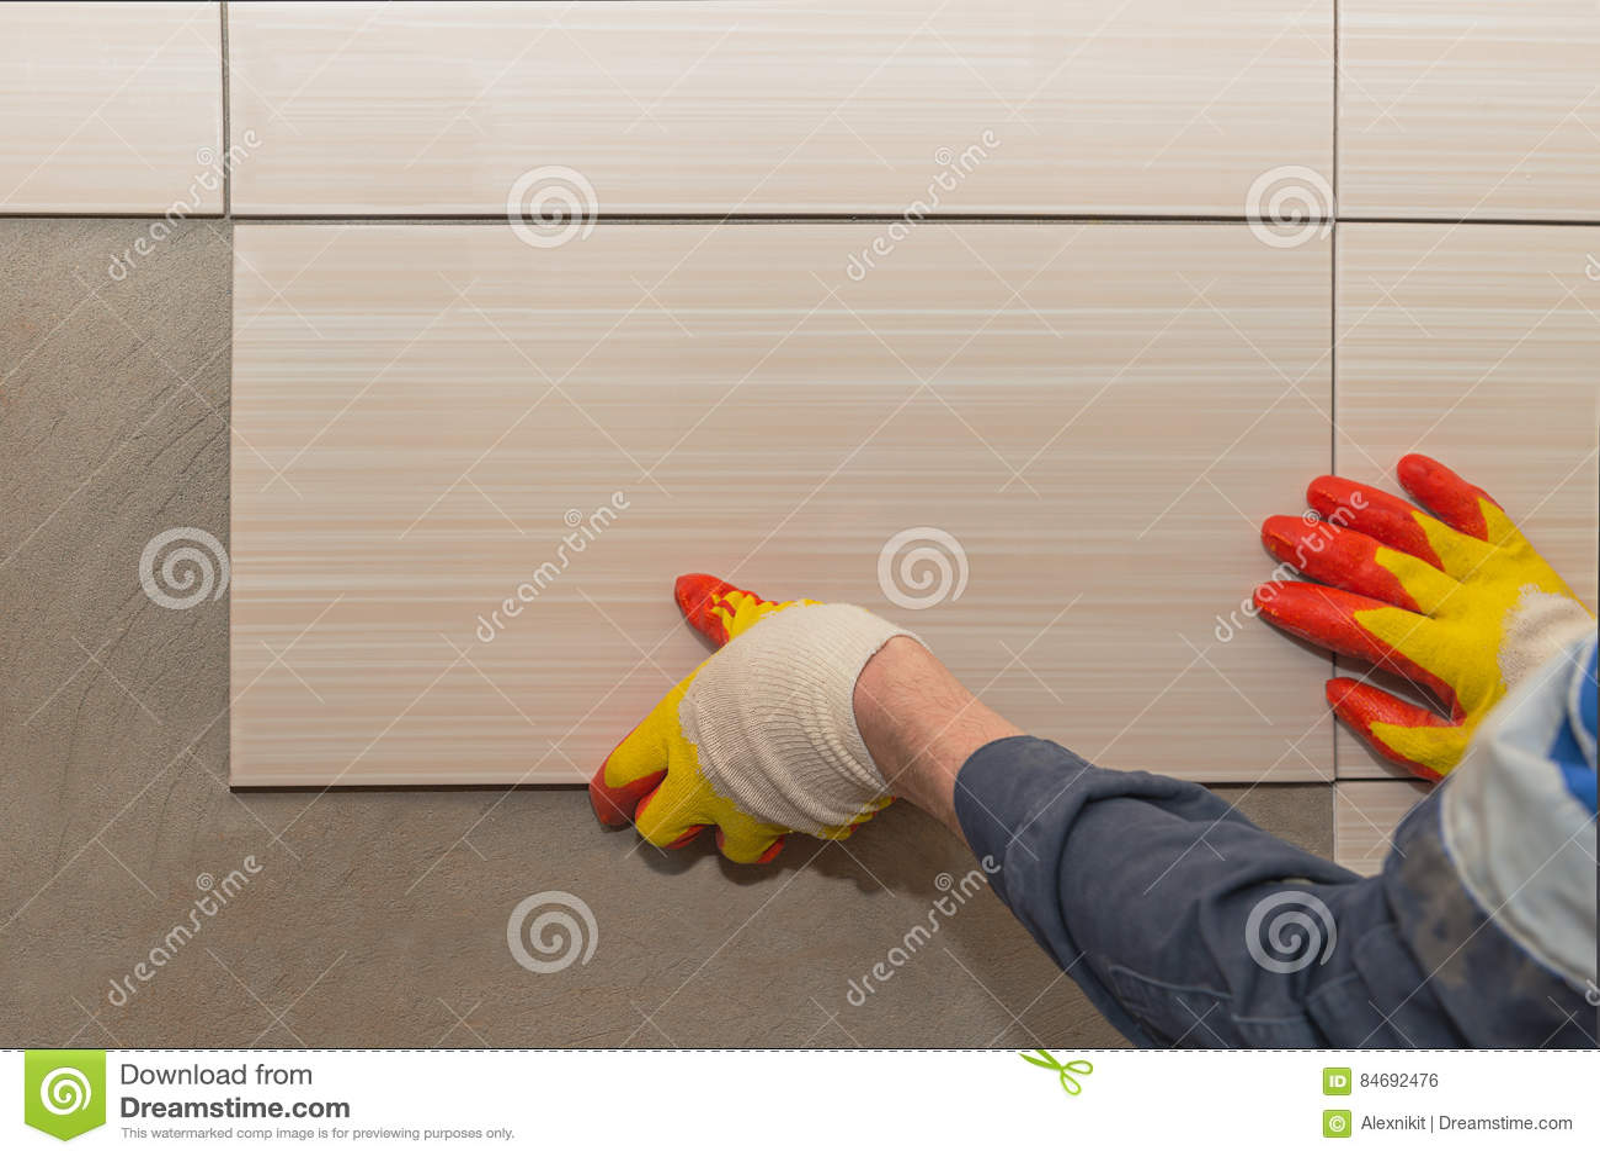 Laying tiles on the wall stock photo. Image of human - 84692476